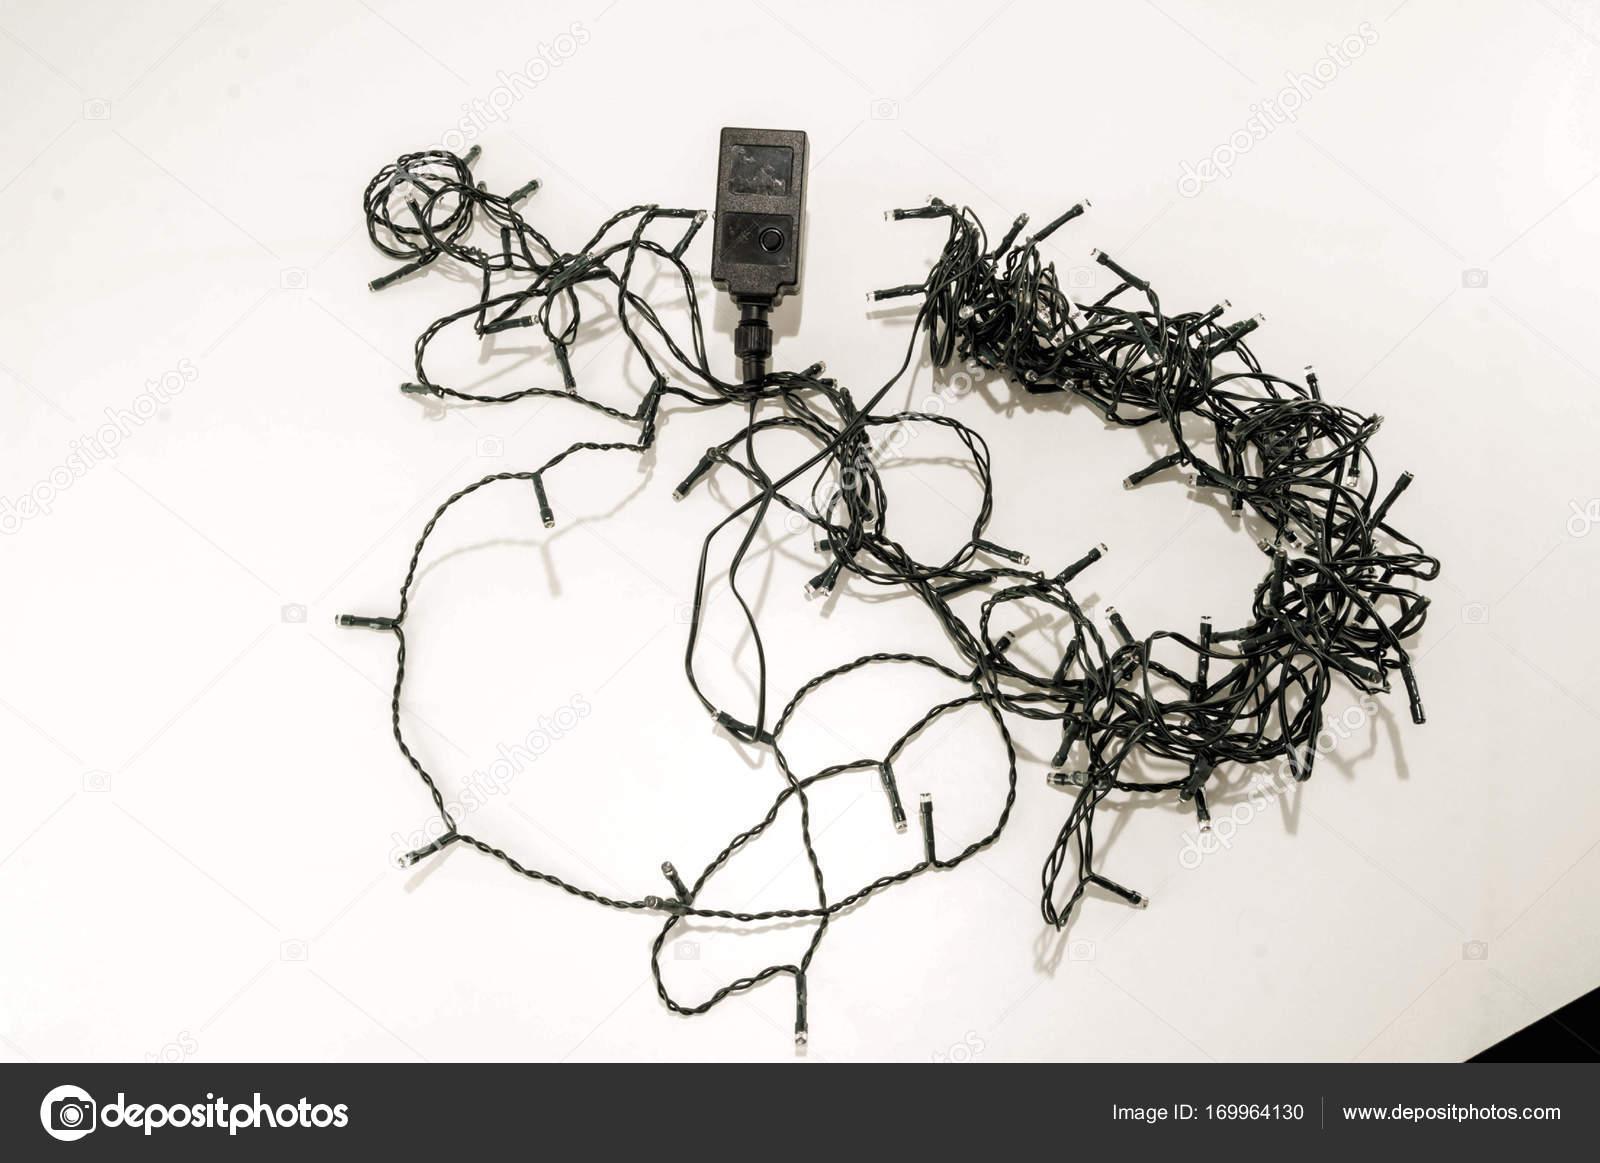 hight resolution of tangled led christmas lights stock photo